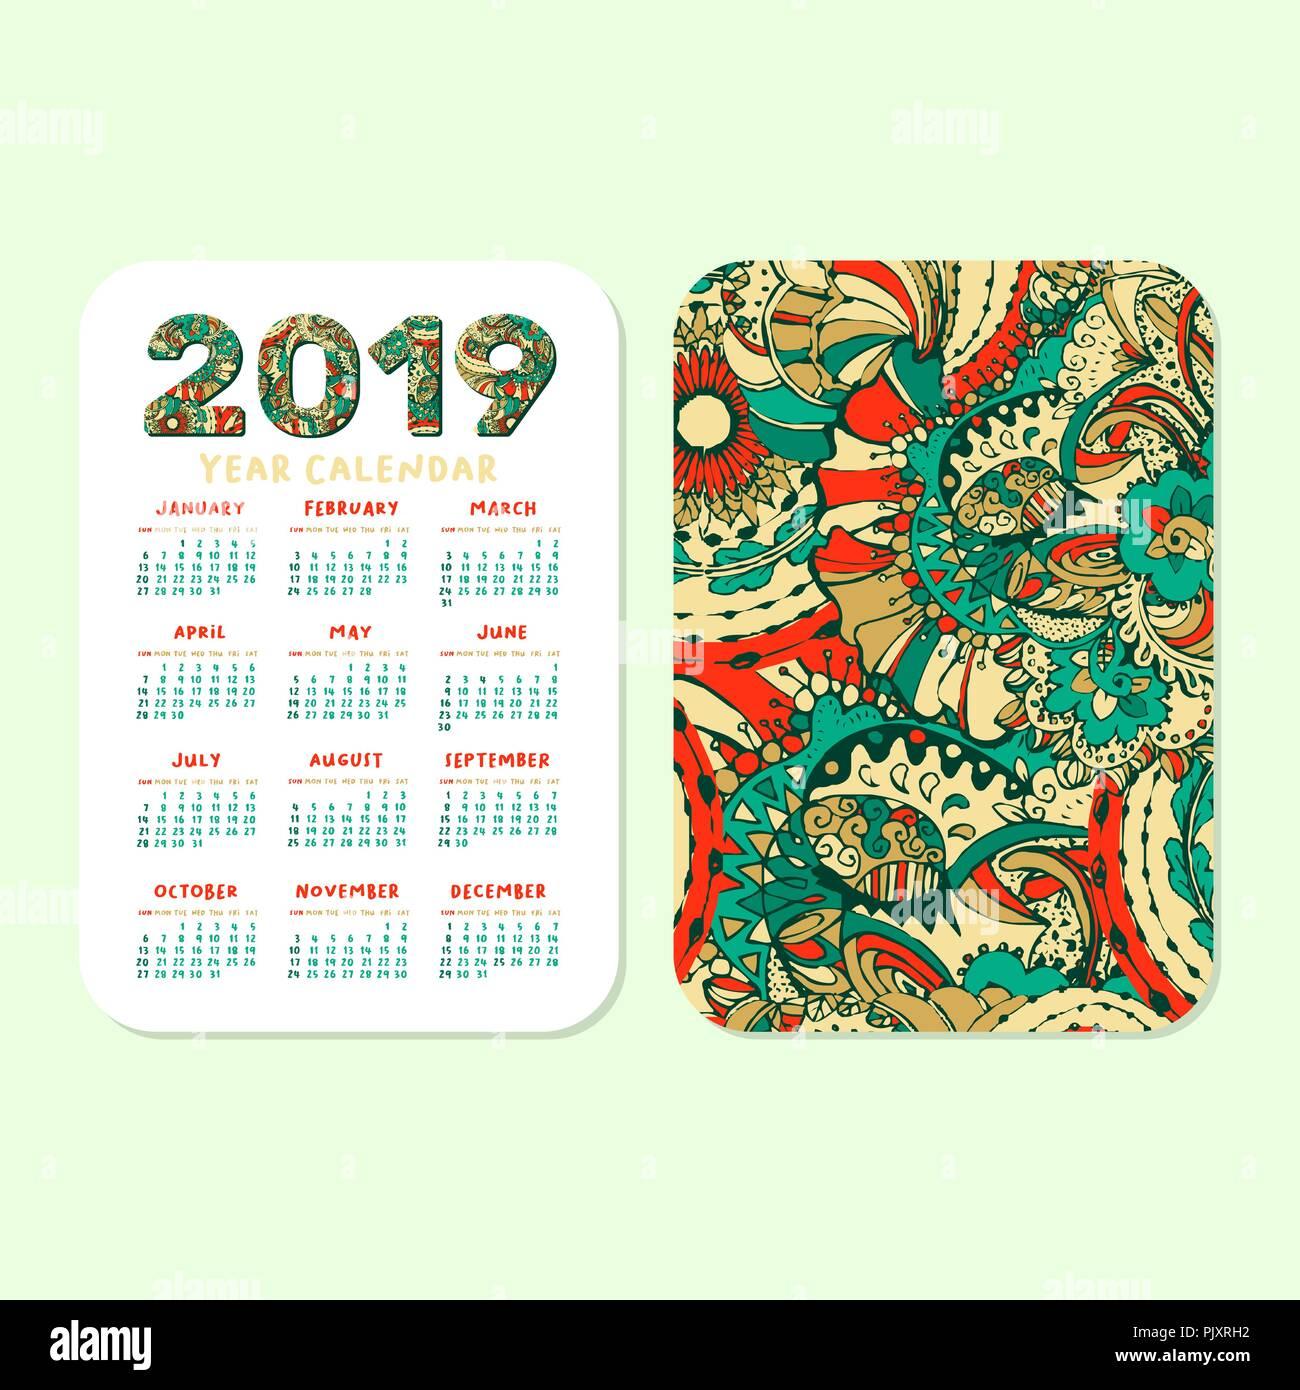 image regarding Printable Pocket Calendars named 2019 Pocket Calendar Inventory Images 2019 Pocket Calendar